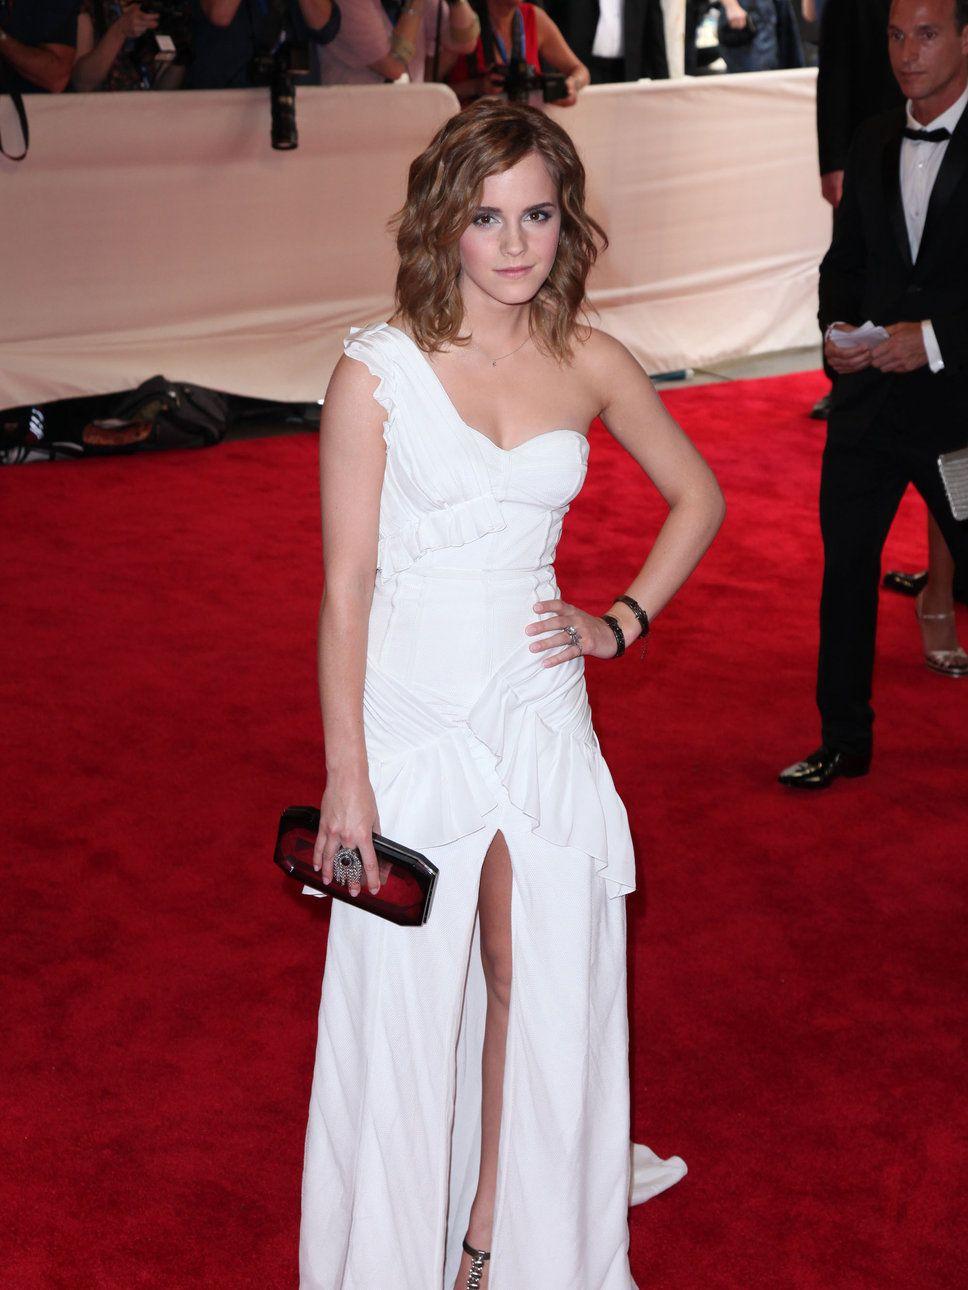 White dress emma watson - Emma Watson One Shoulder White Dress Emma Watson White One Shoulder Slip Dress Red Clutch